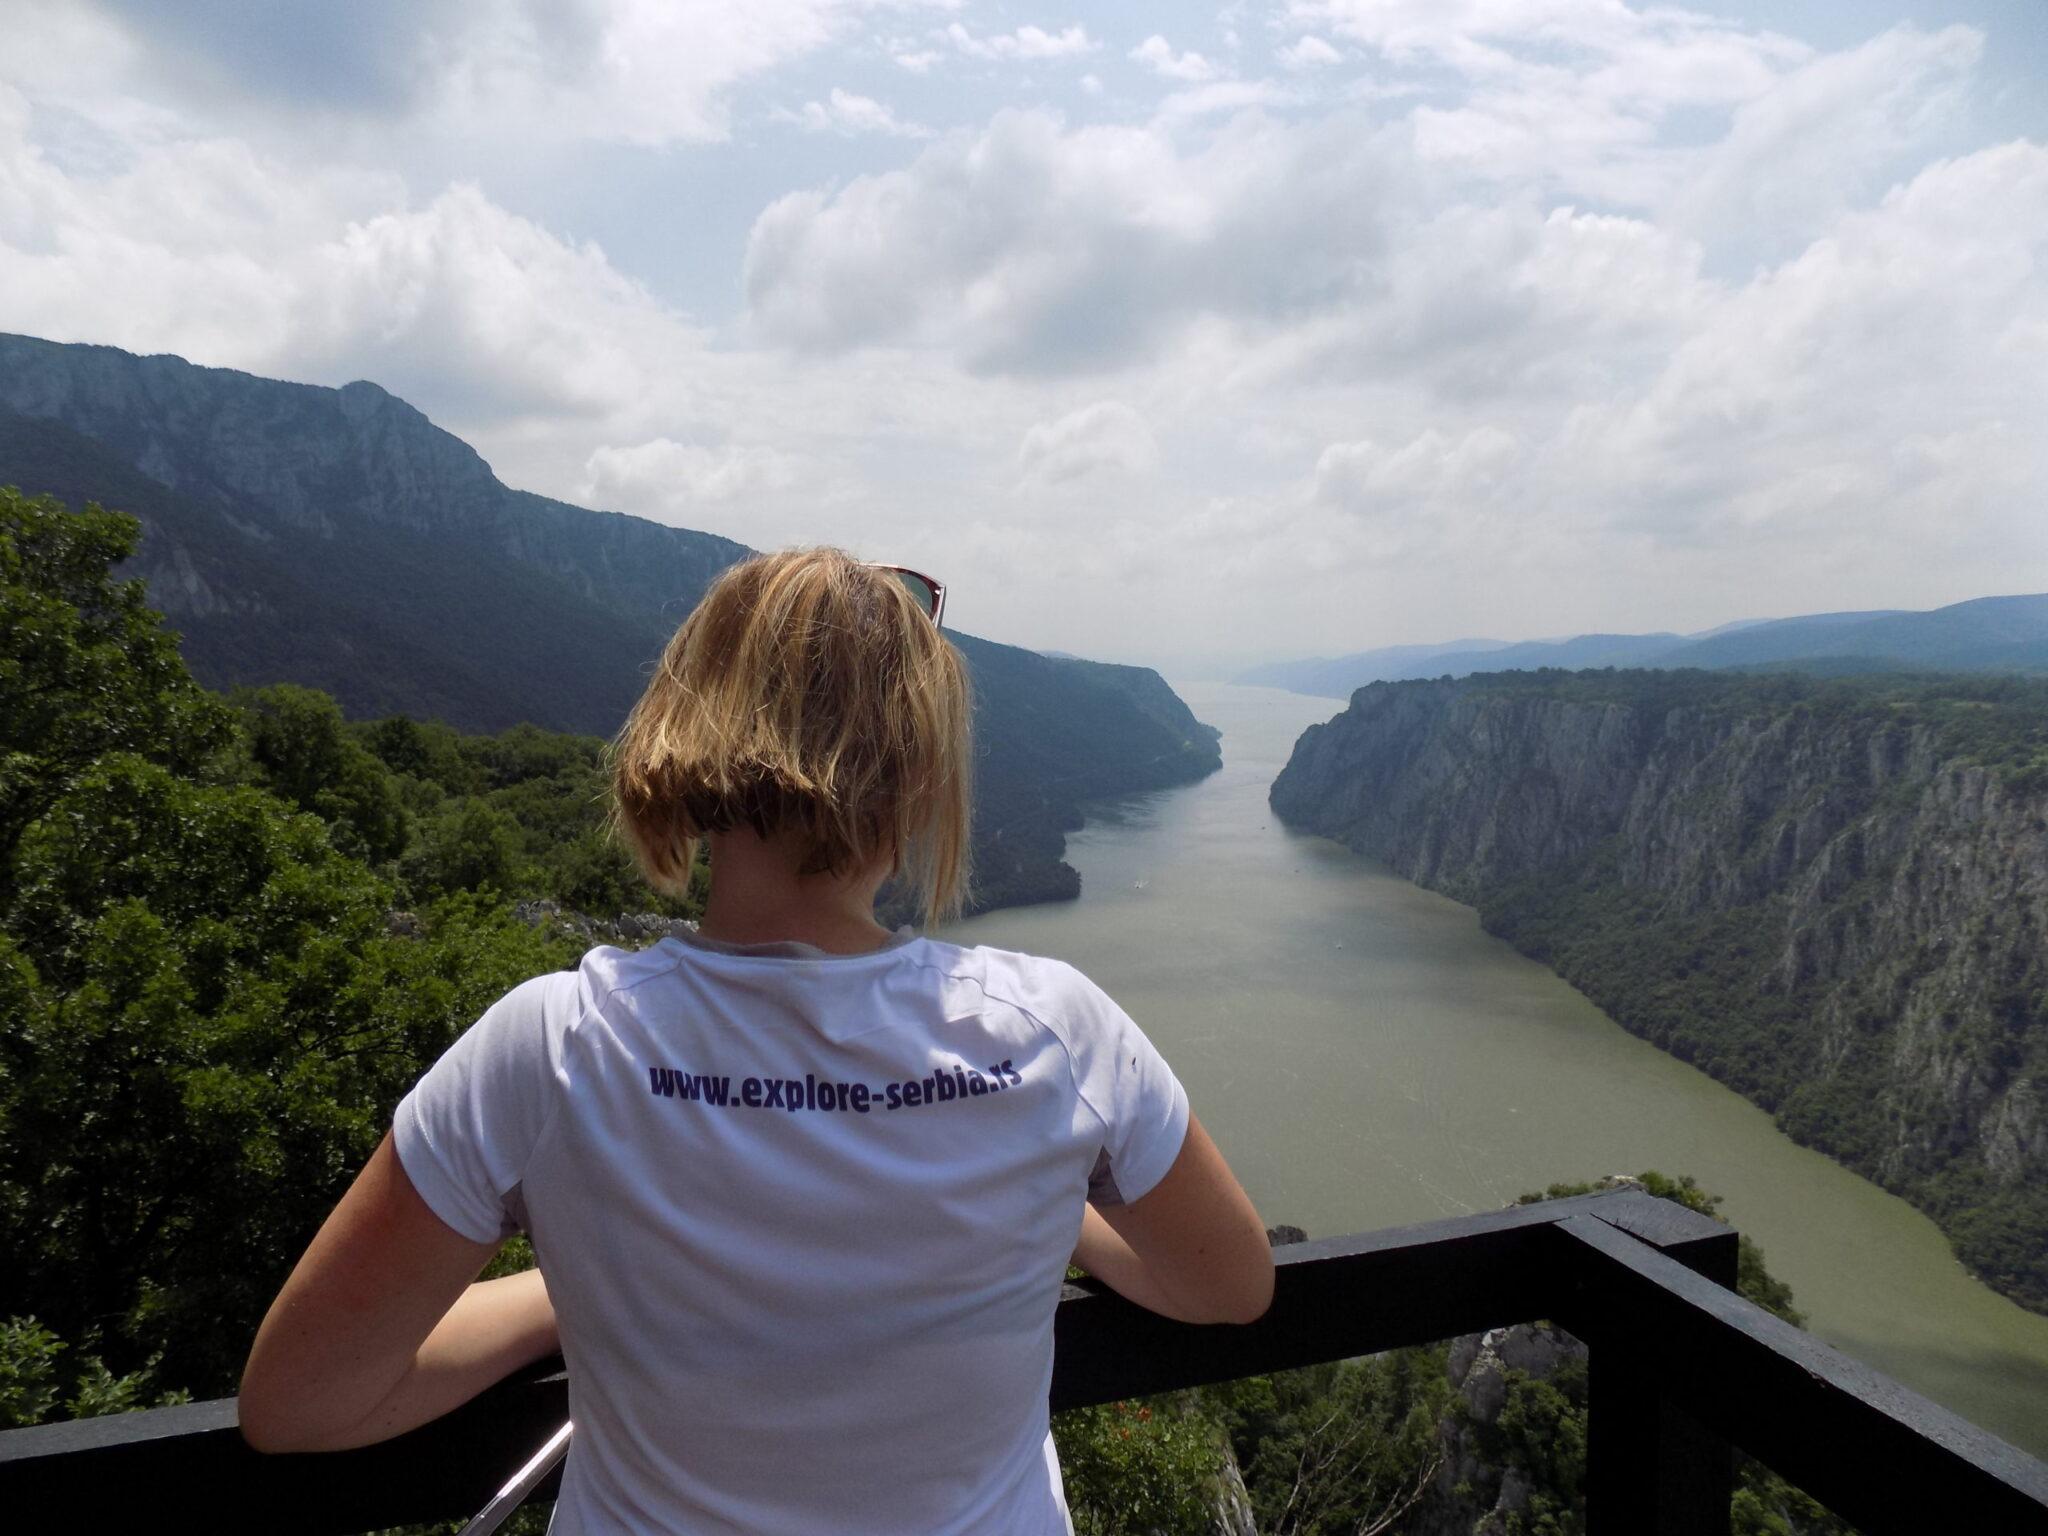 Đerdap pešečenje, Miroč - pešačke ture iz Beograda